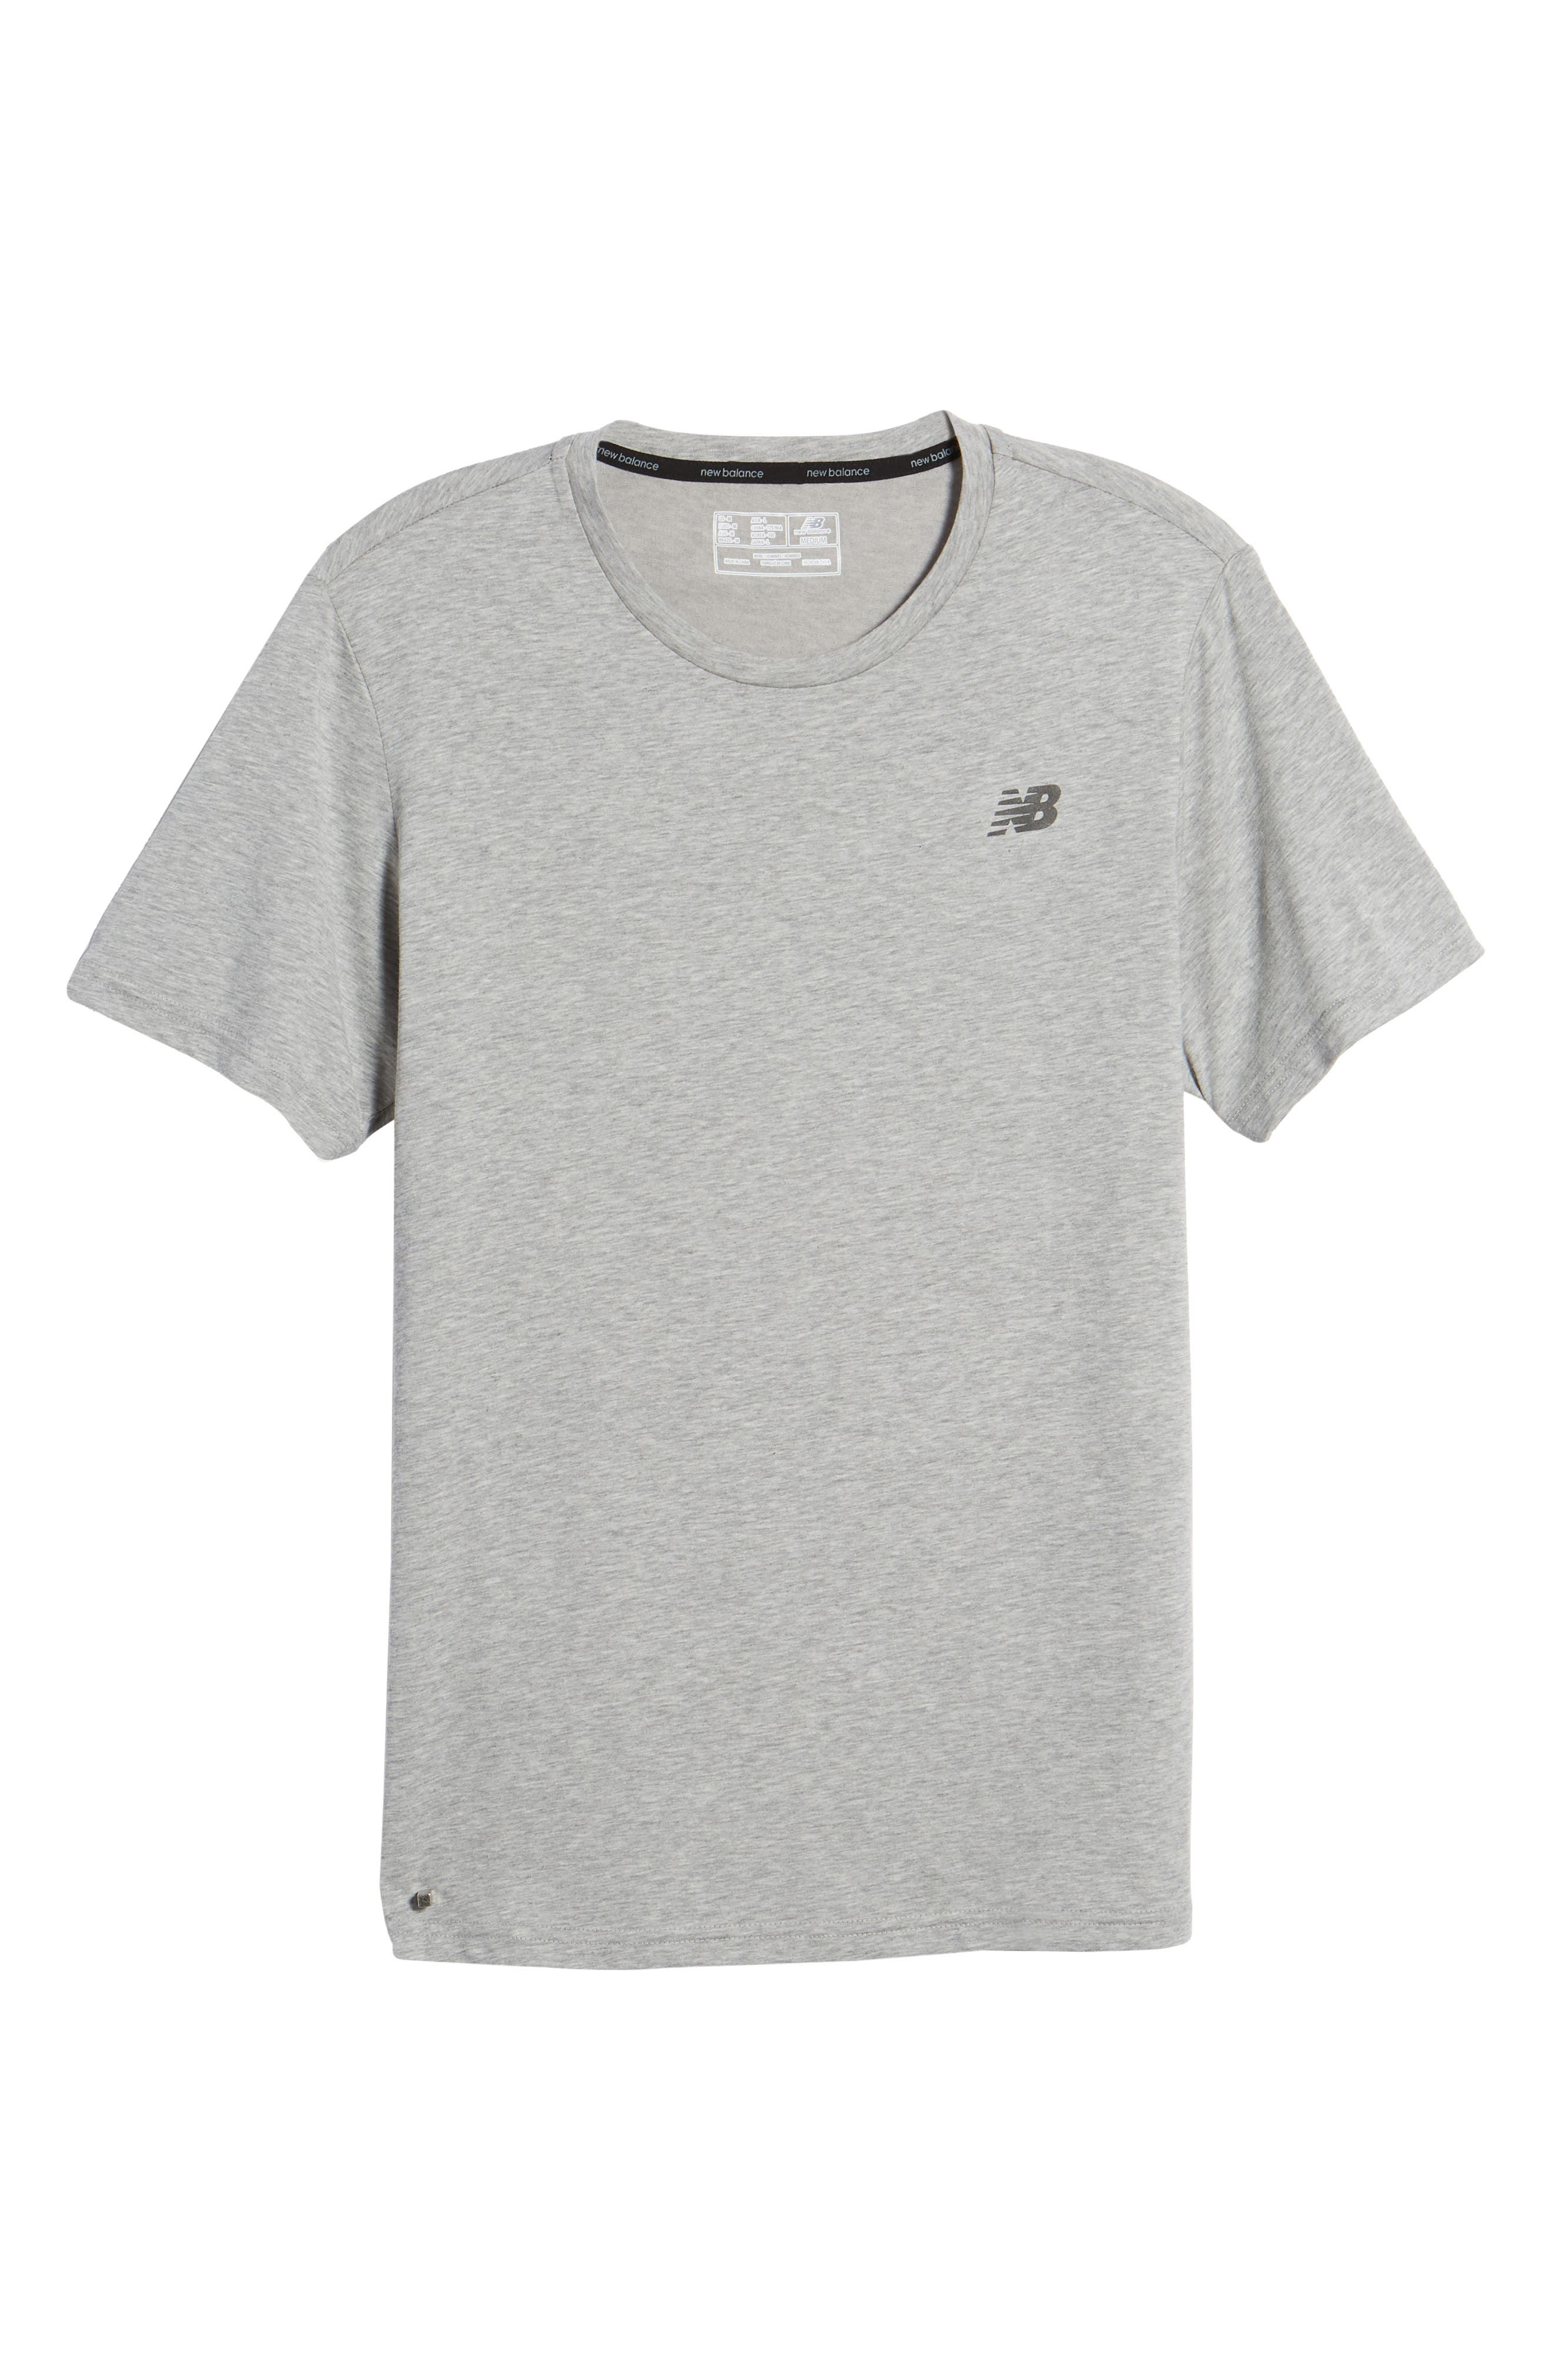 Heather Tech Crewneck T-Shirt,                             Alternate thumbnail 6, color,                             ATHLETIC GREY